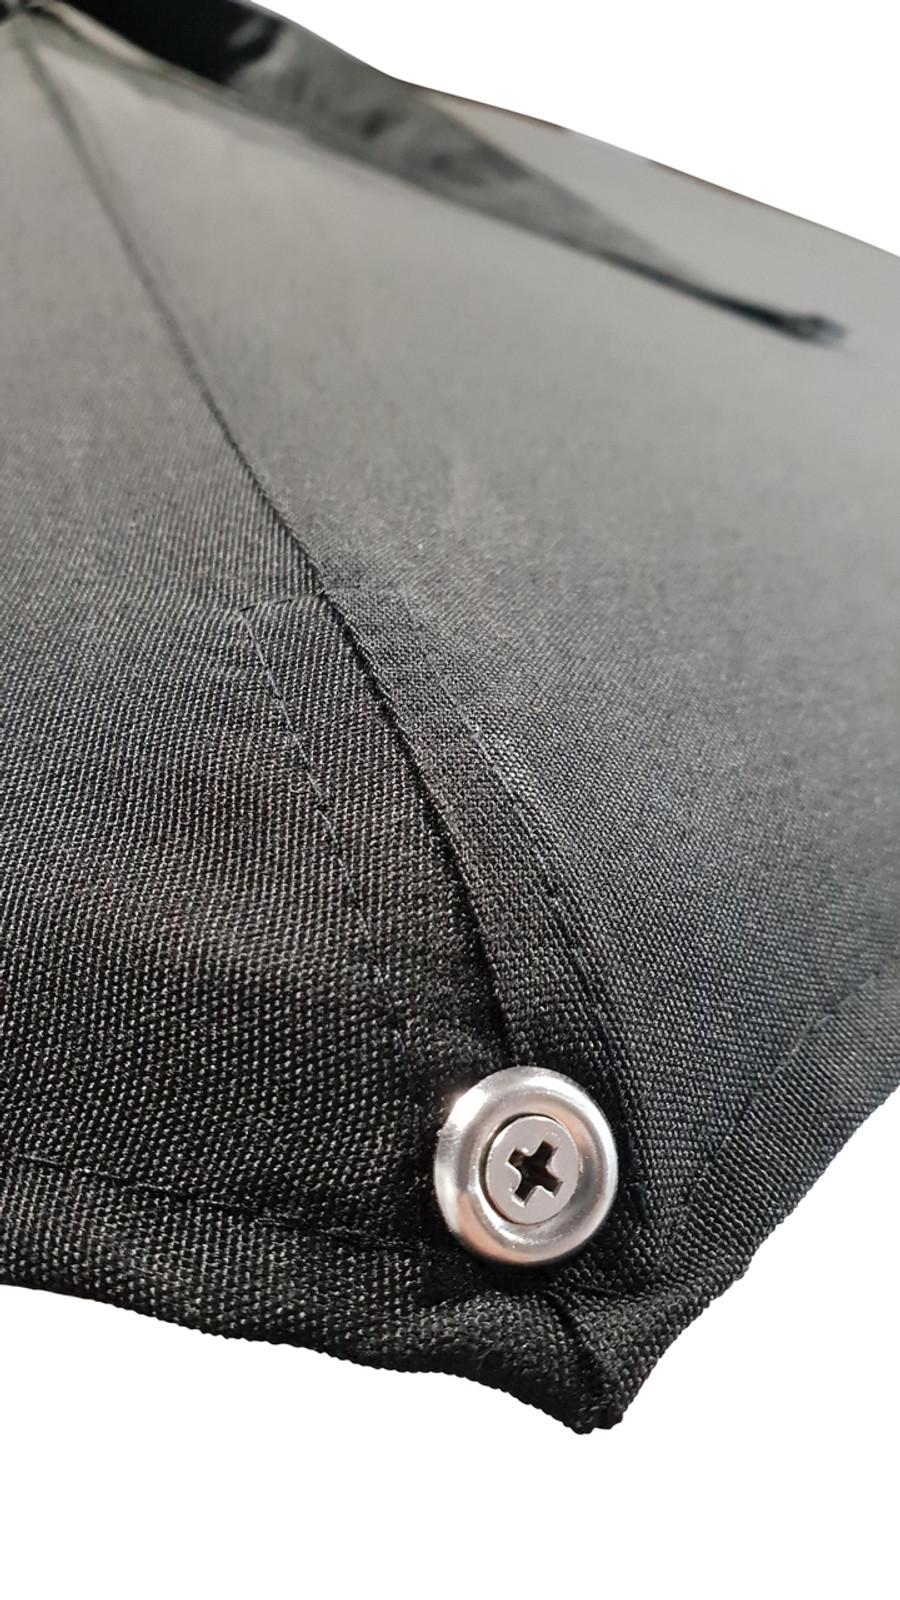 Monza 3.5m umbrella plastic end clip on rib and screw fitting